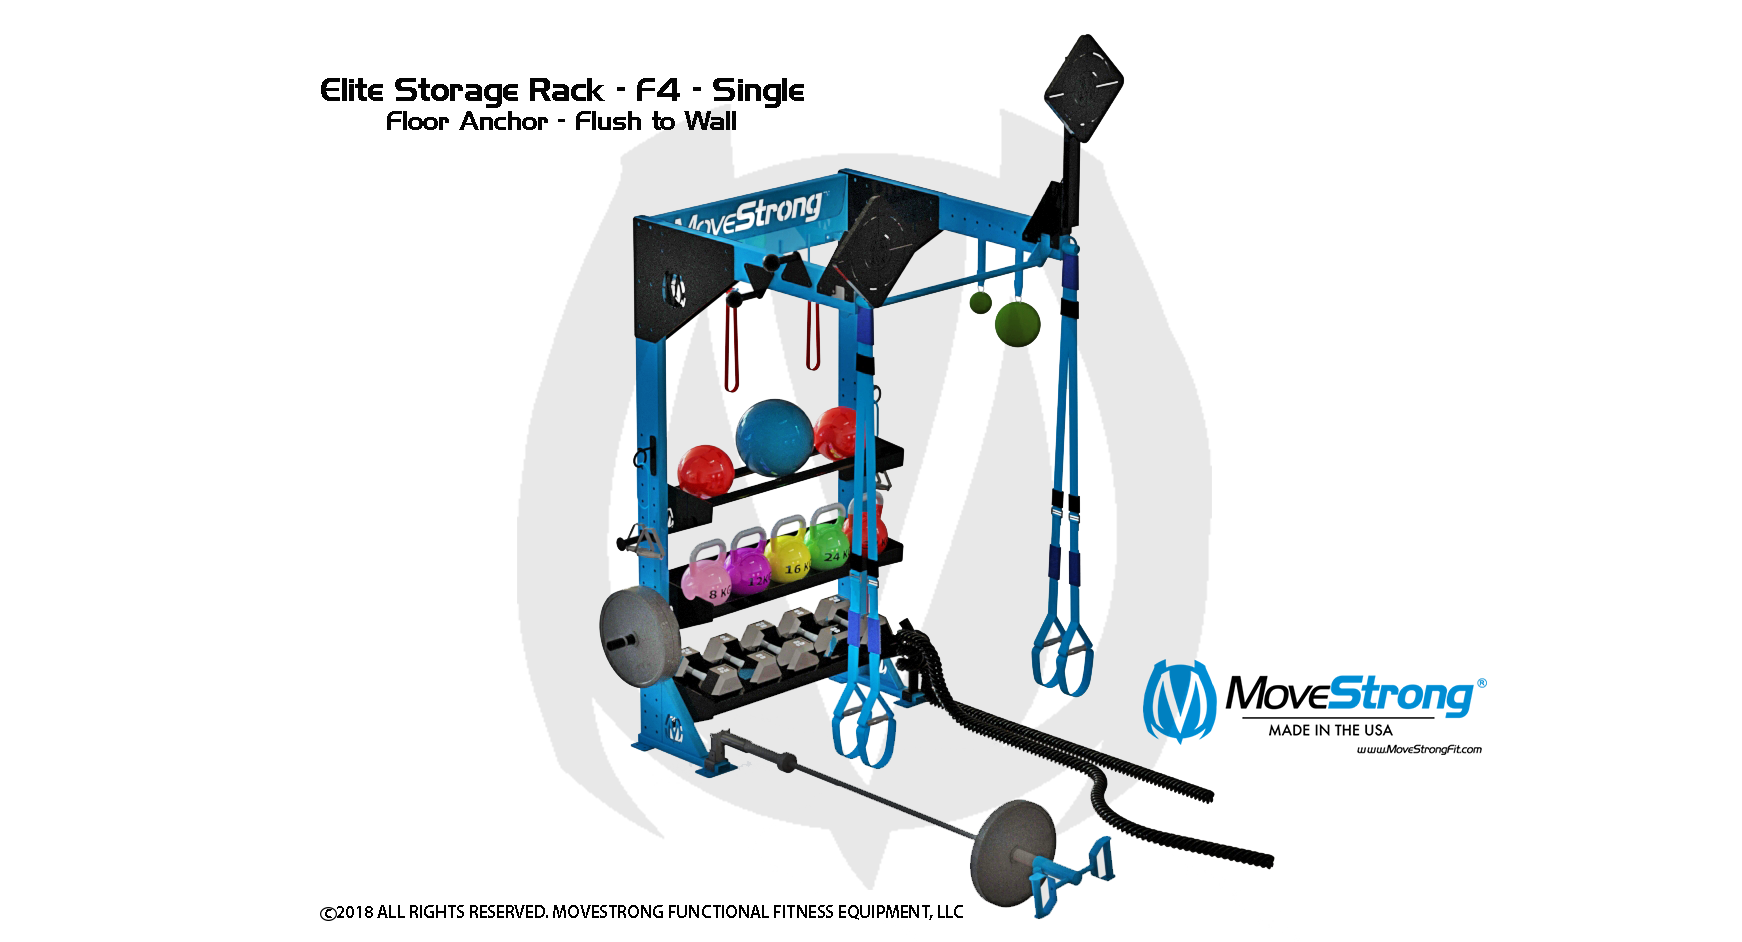 Gym studio design for functional fitness storage